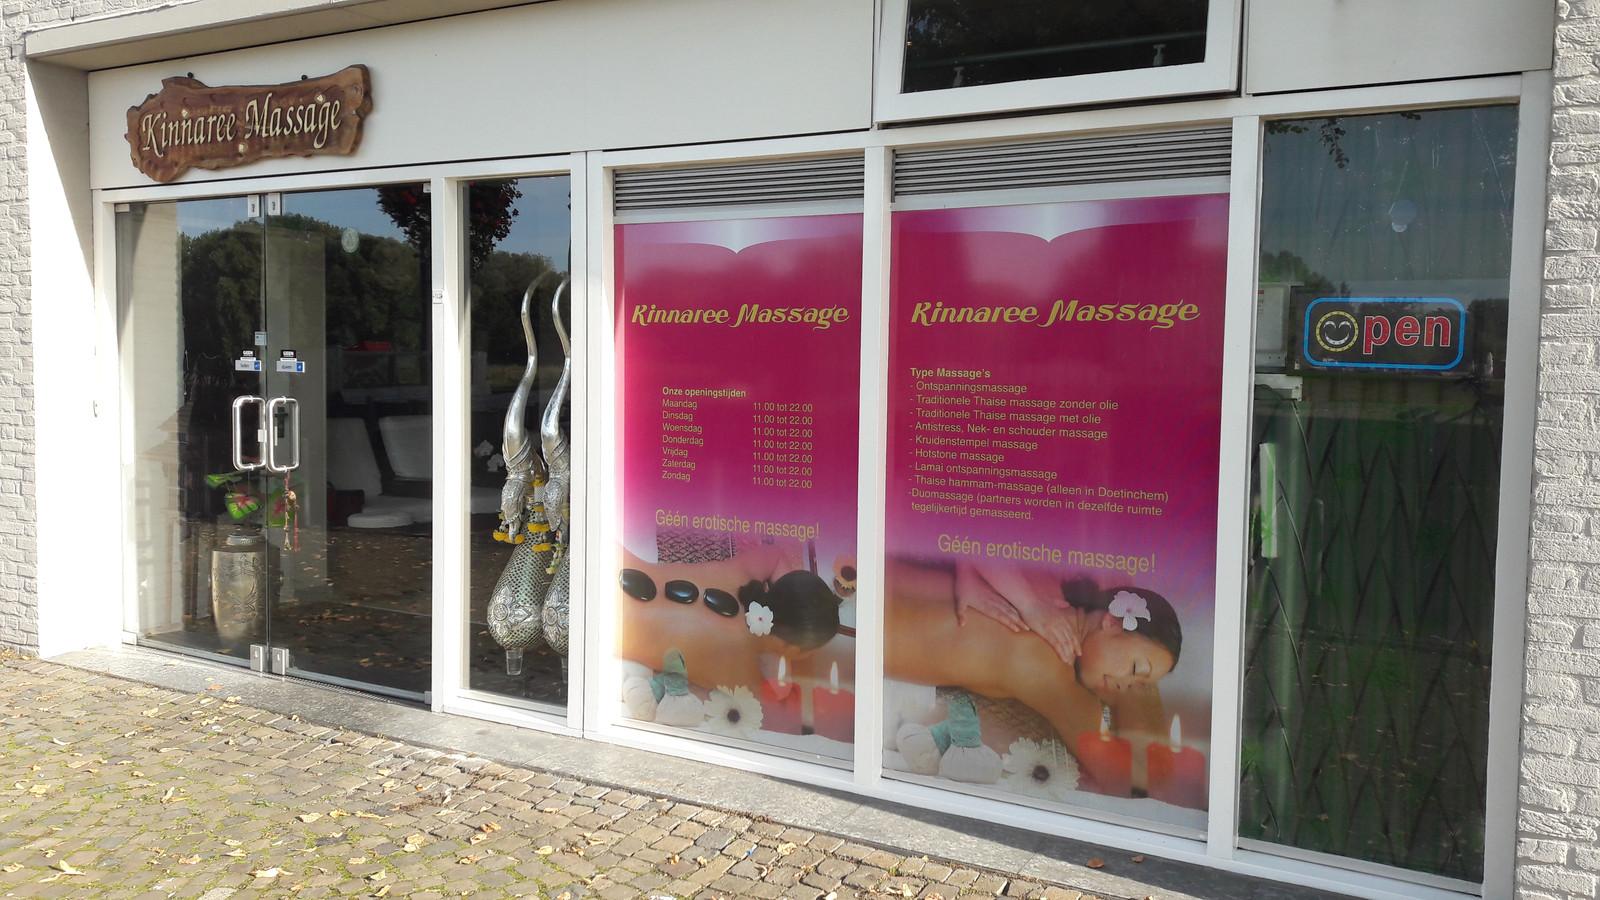 Kinnaree Massage aan de Rijnkade in Arnhem.